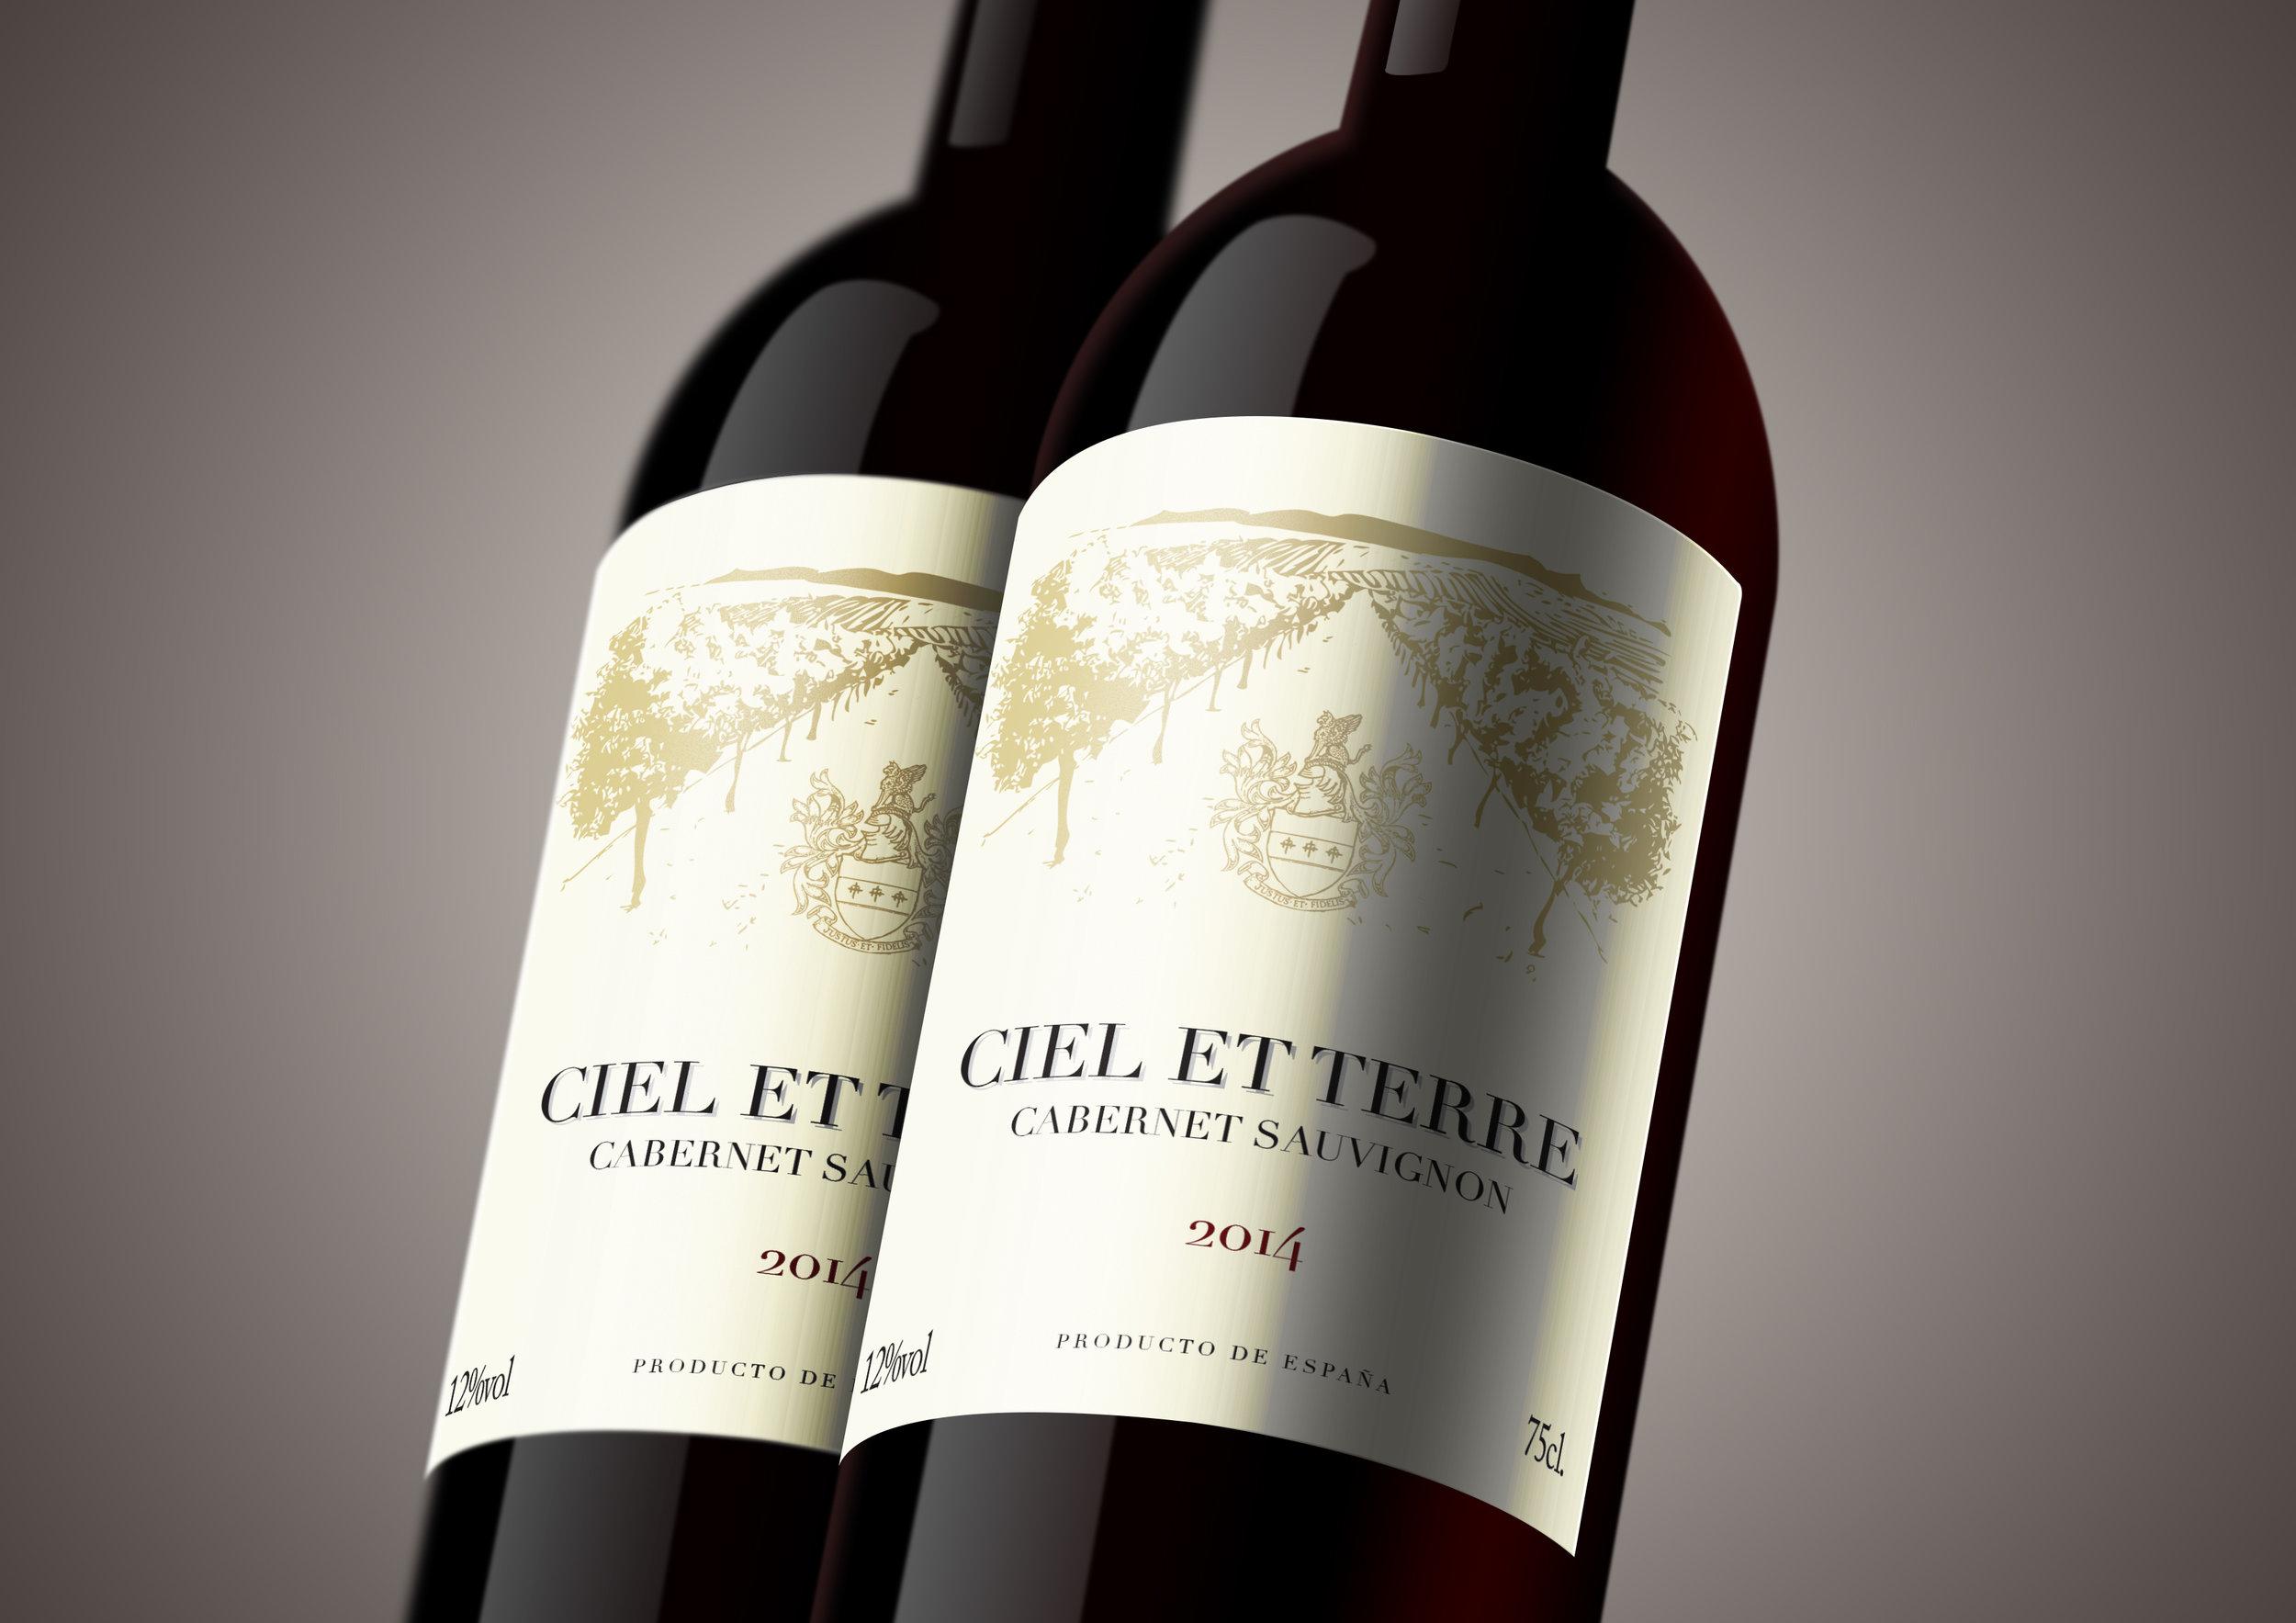 Ciel Et Terre 2 bottle shot.jpg